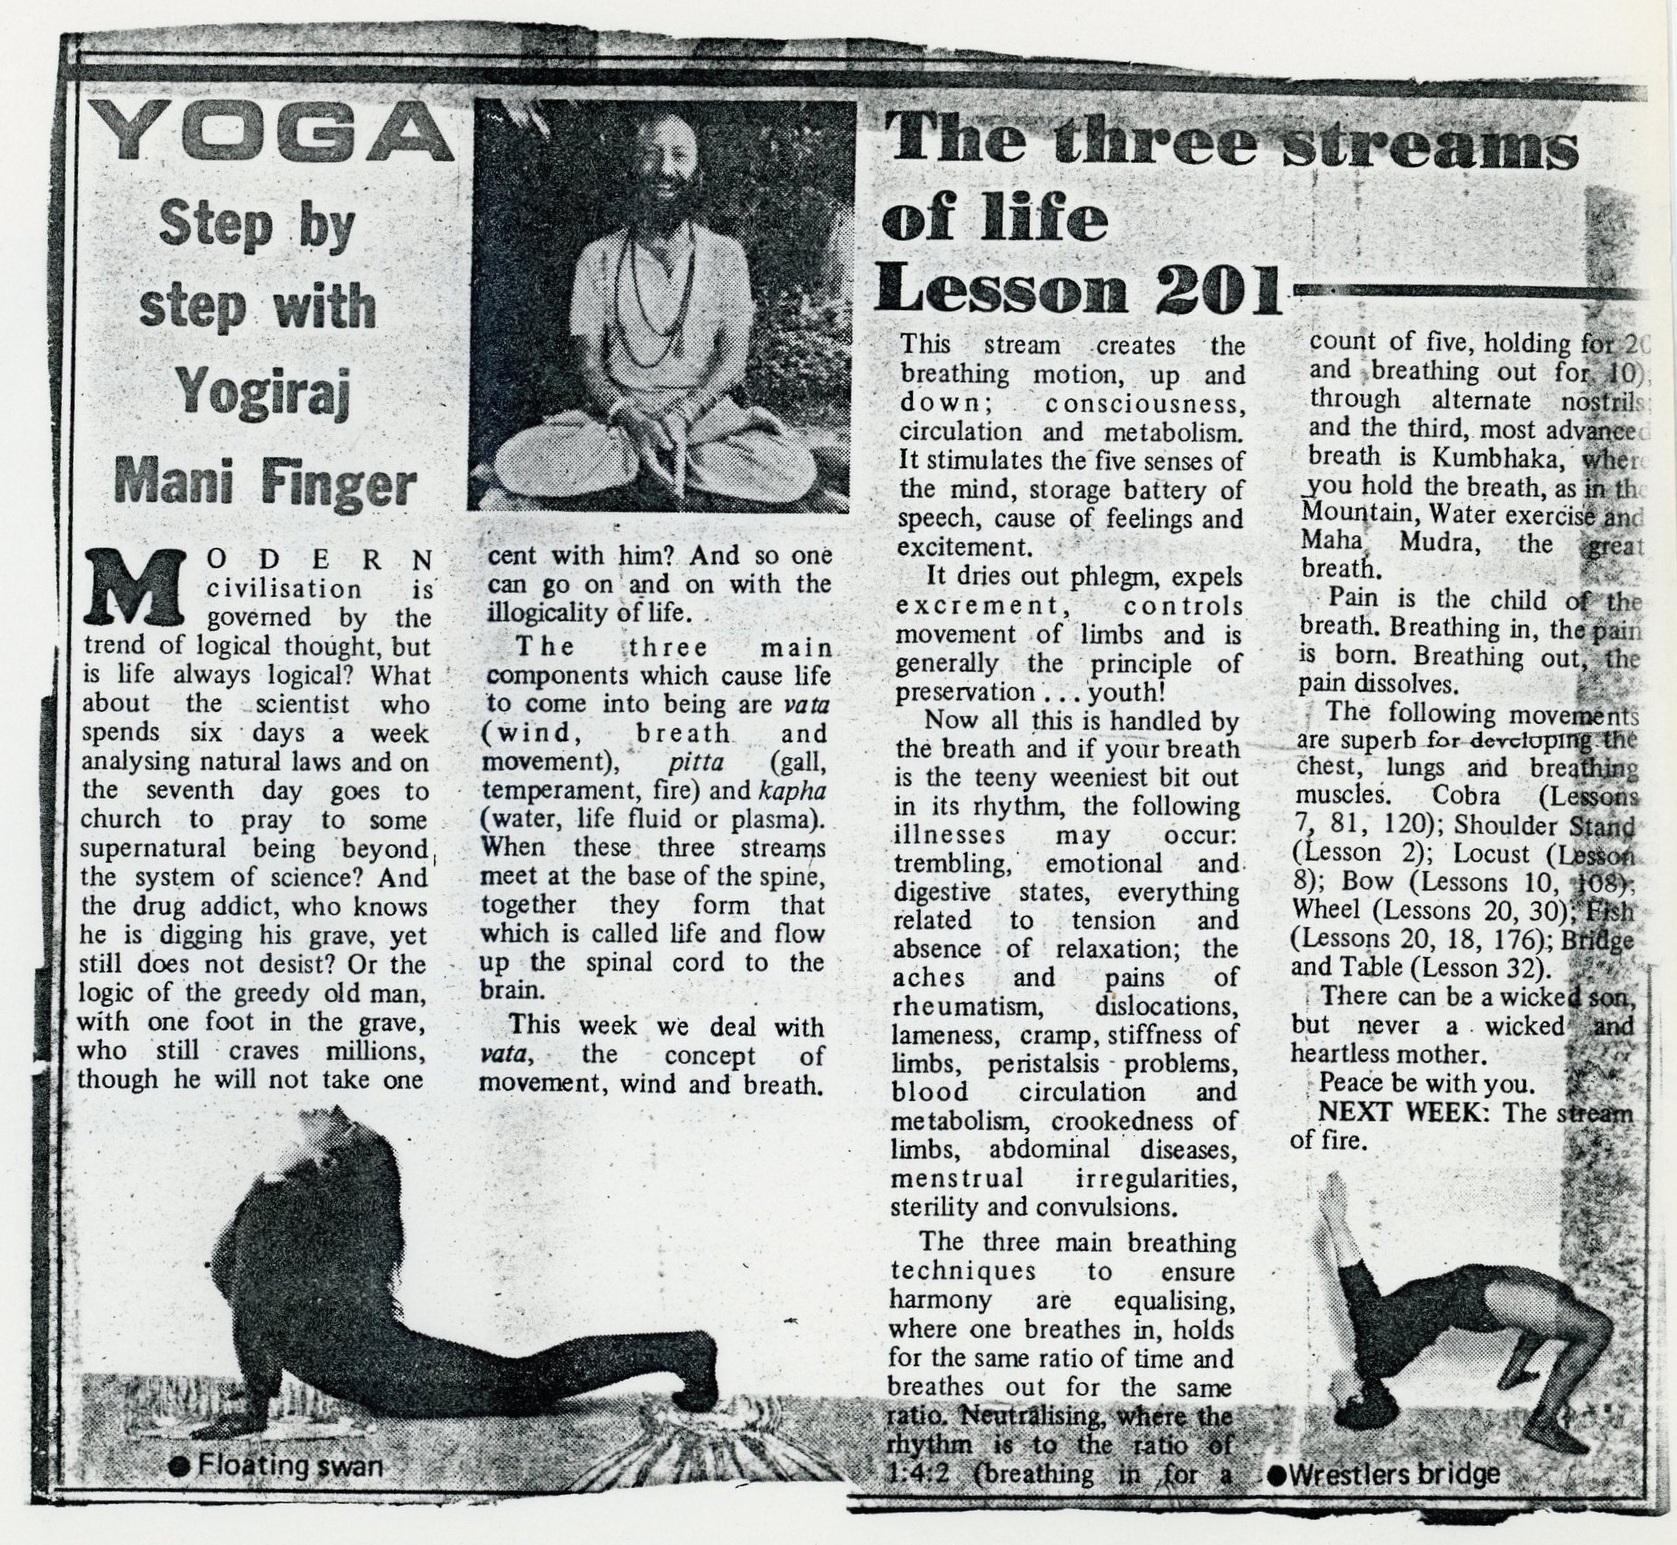 Yogiraj Mani Finger's yoga column in a Johannesburg paper